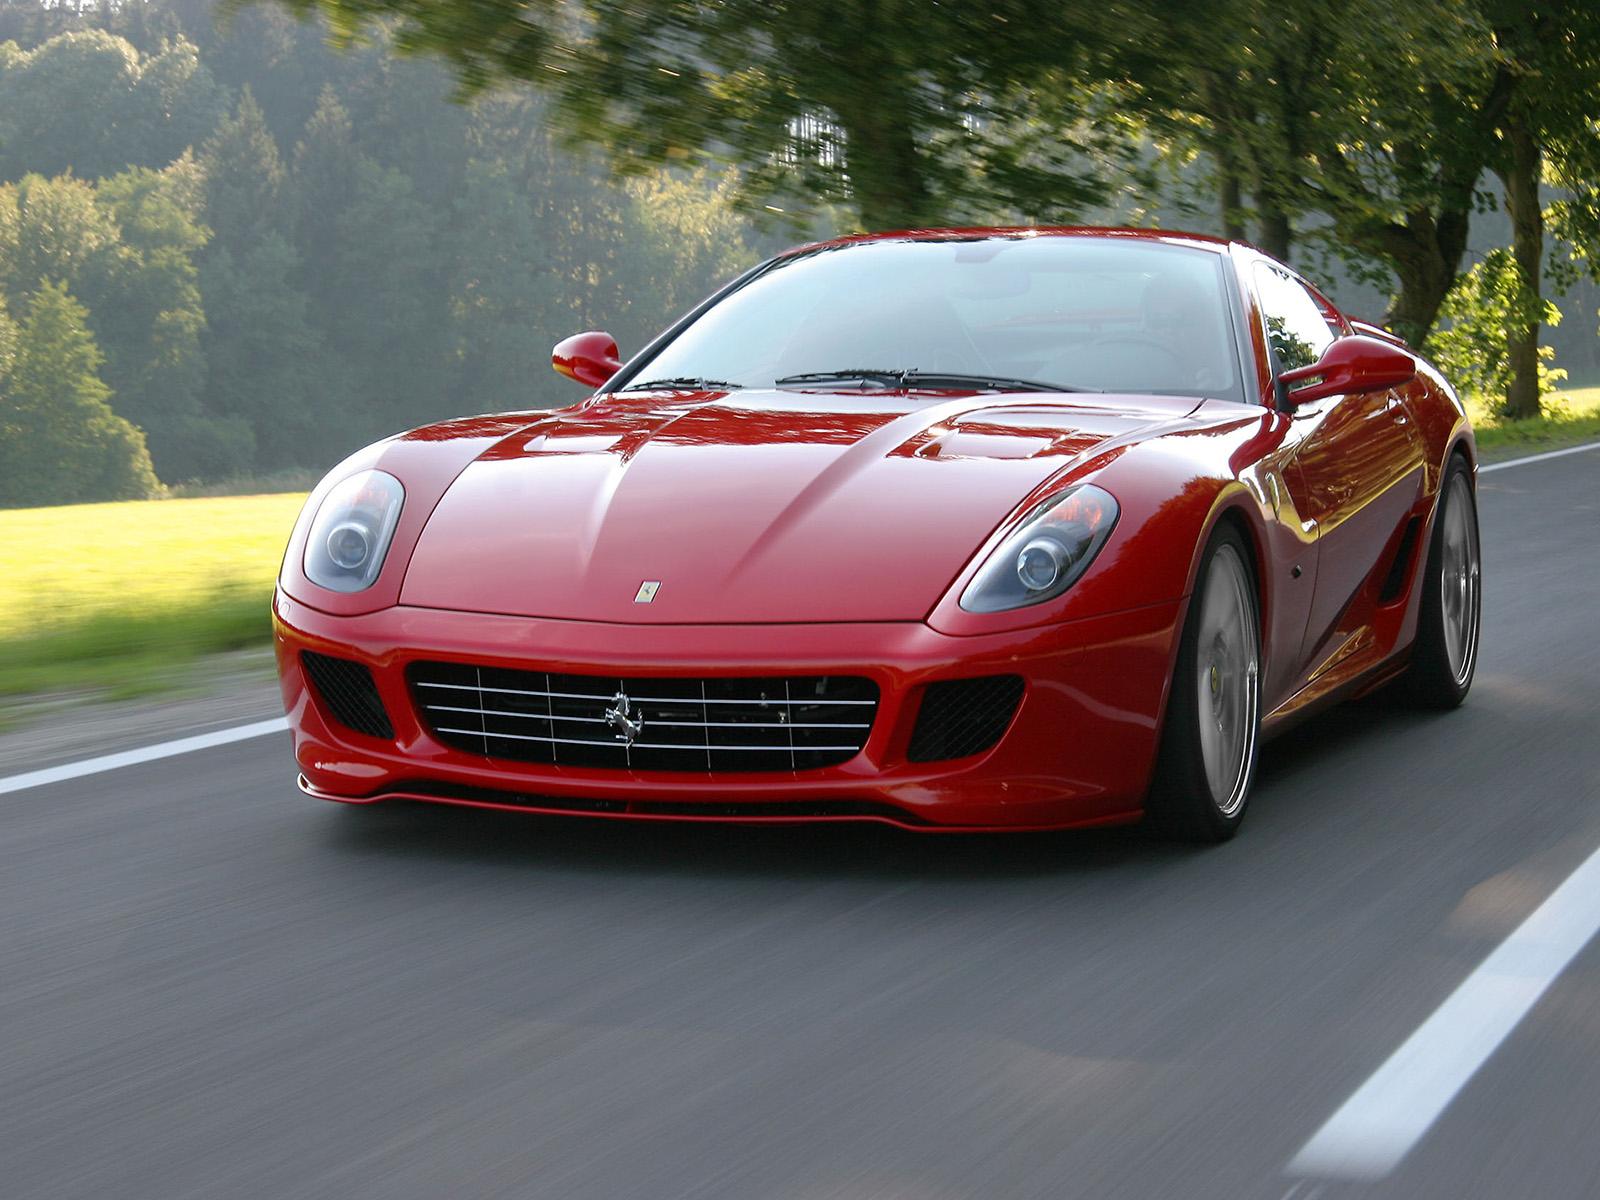 [30/03] FERRARI 599 Novitec_Rosso-Ferrari_599_GTB_Fior_mp240_pic_50368